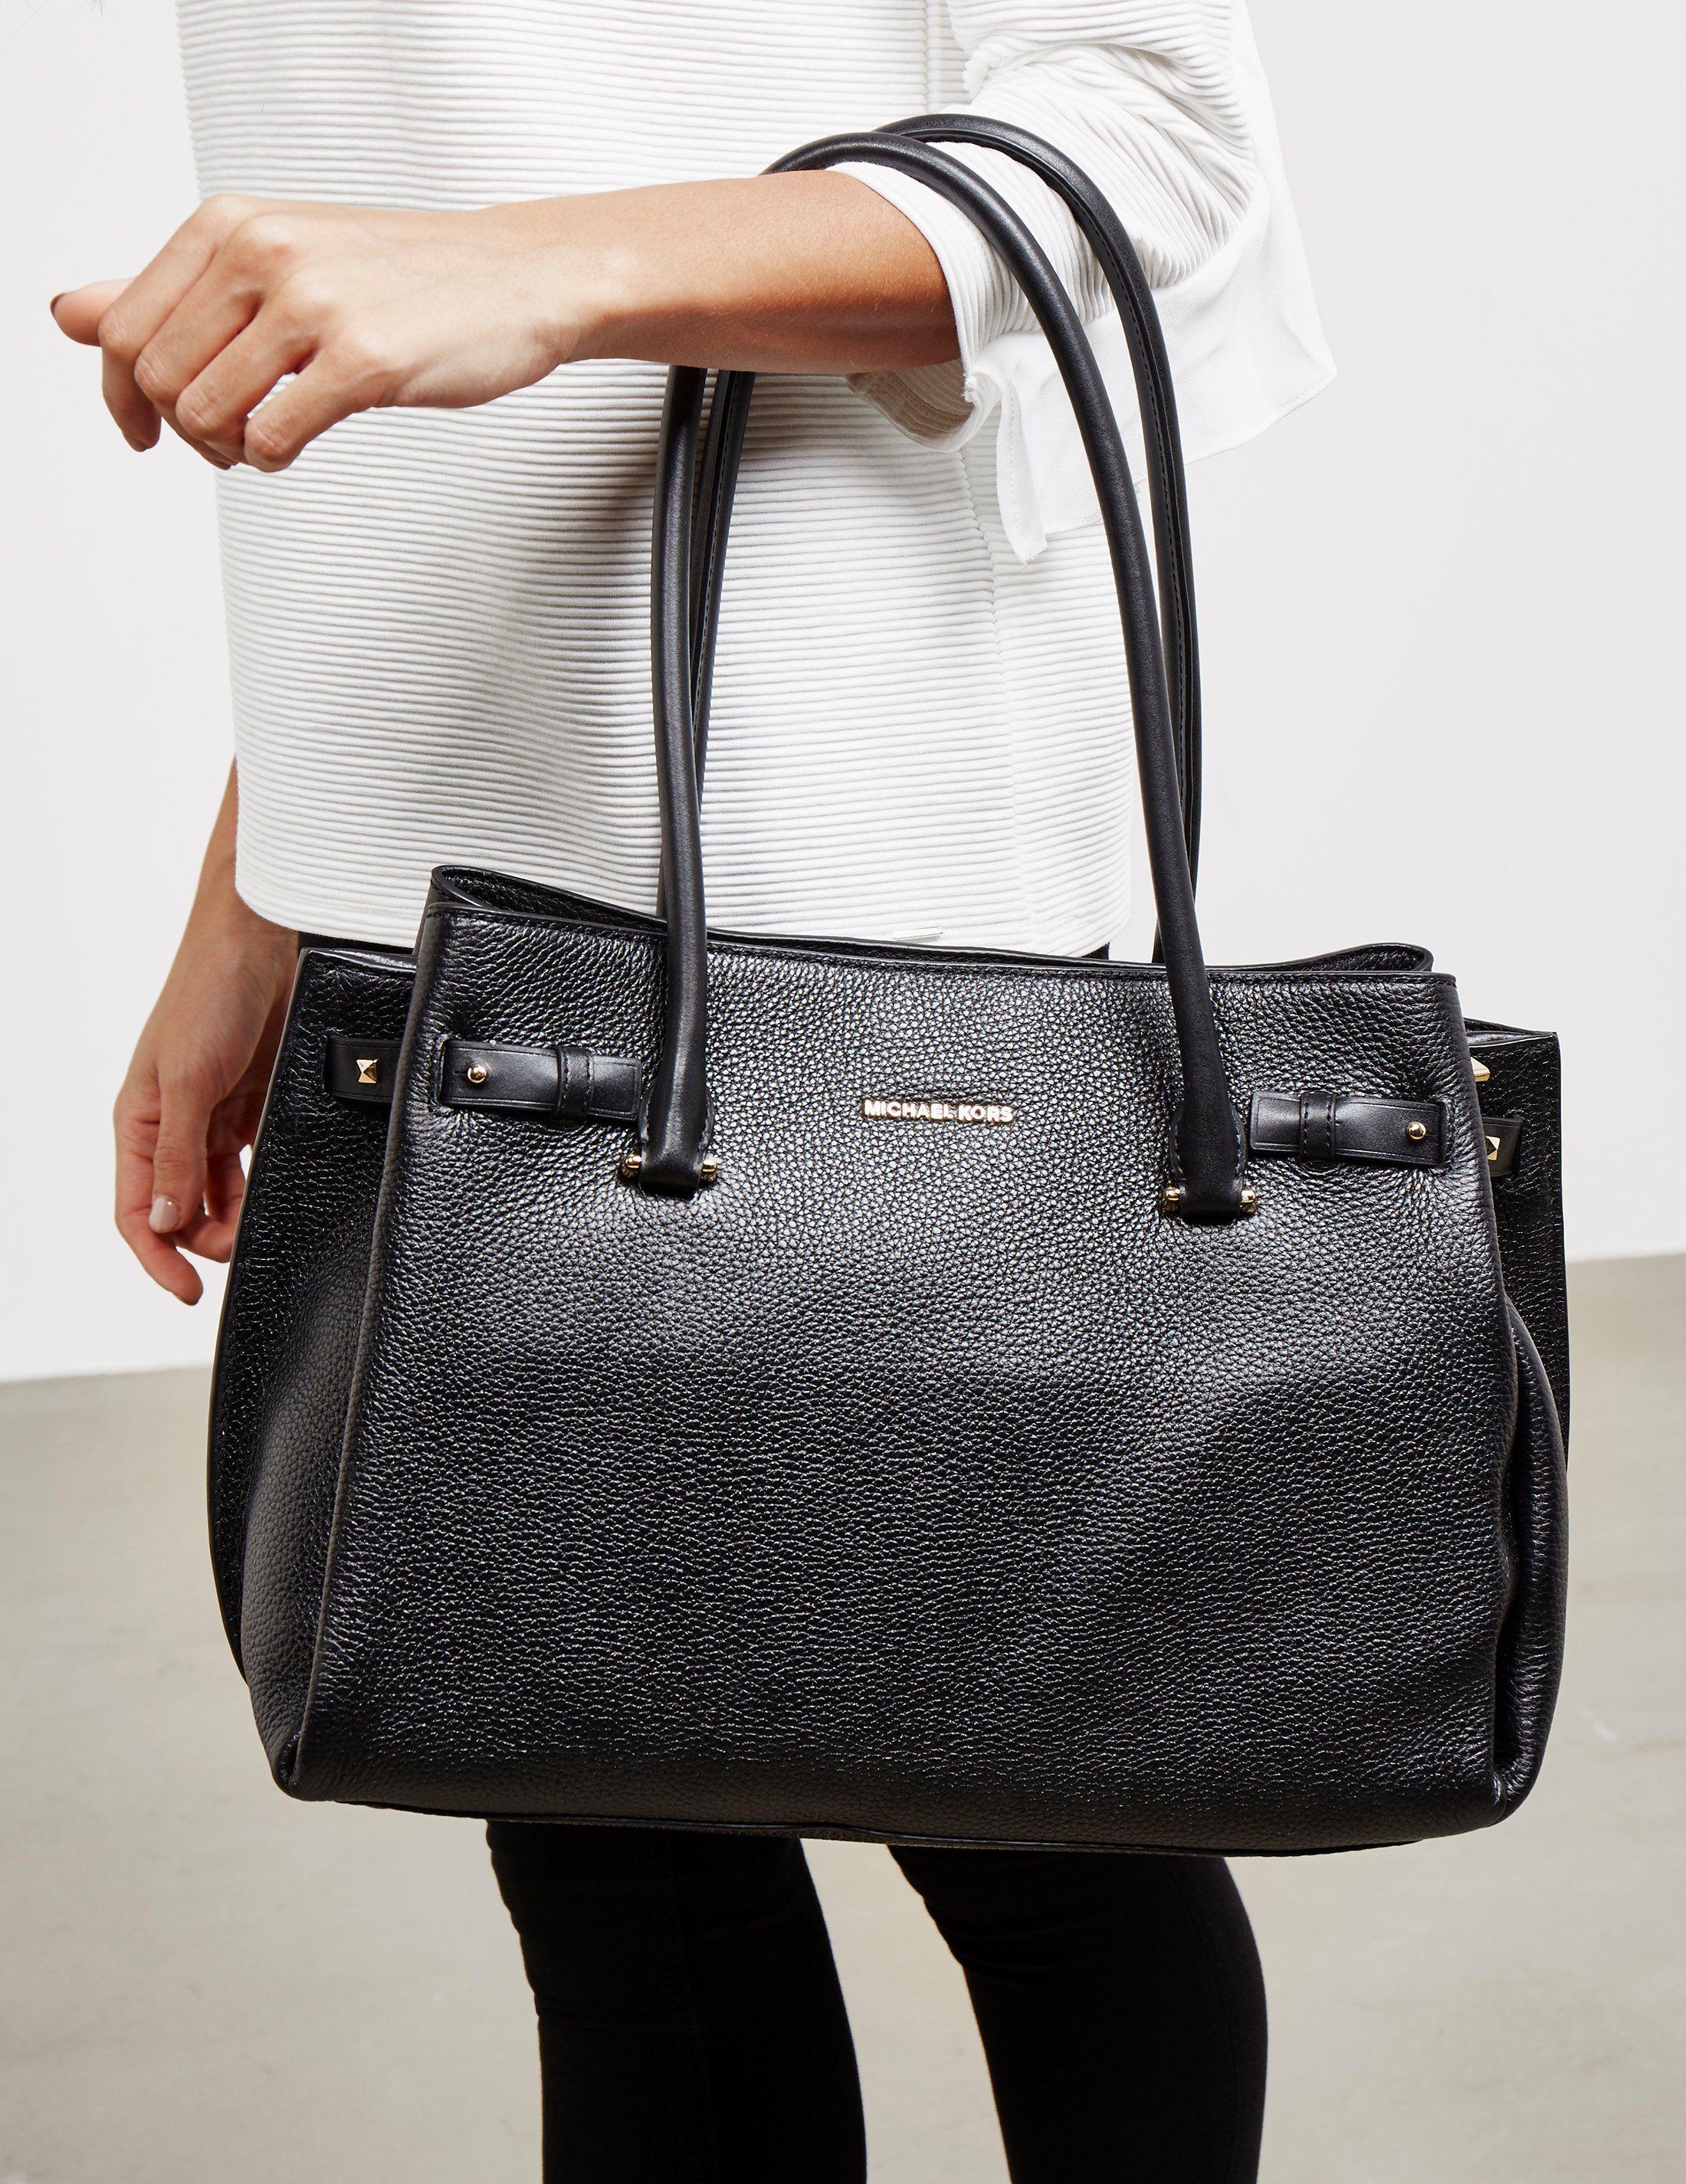 Michael Kors Borsa Shopping Bag - Online Exclusive